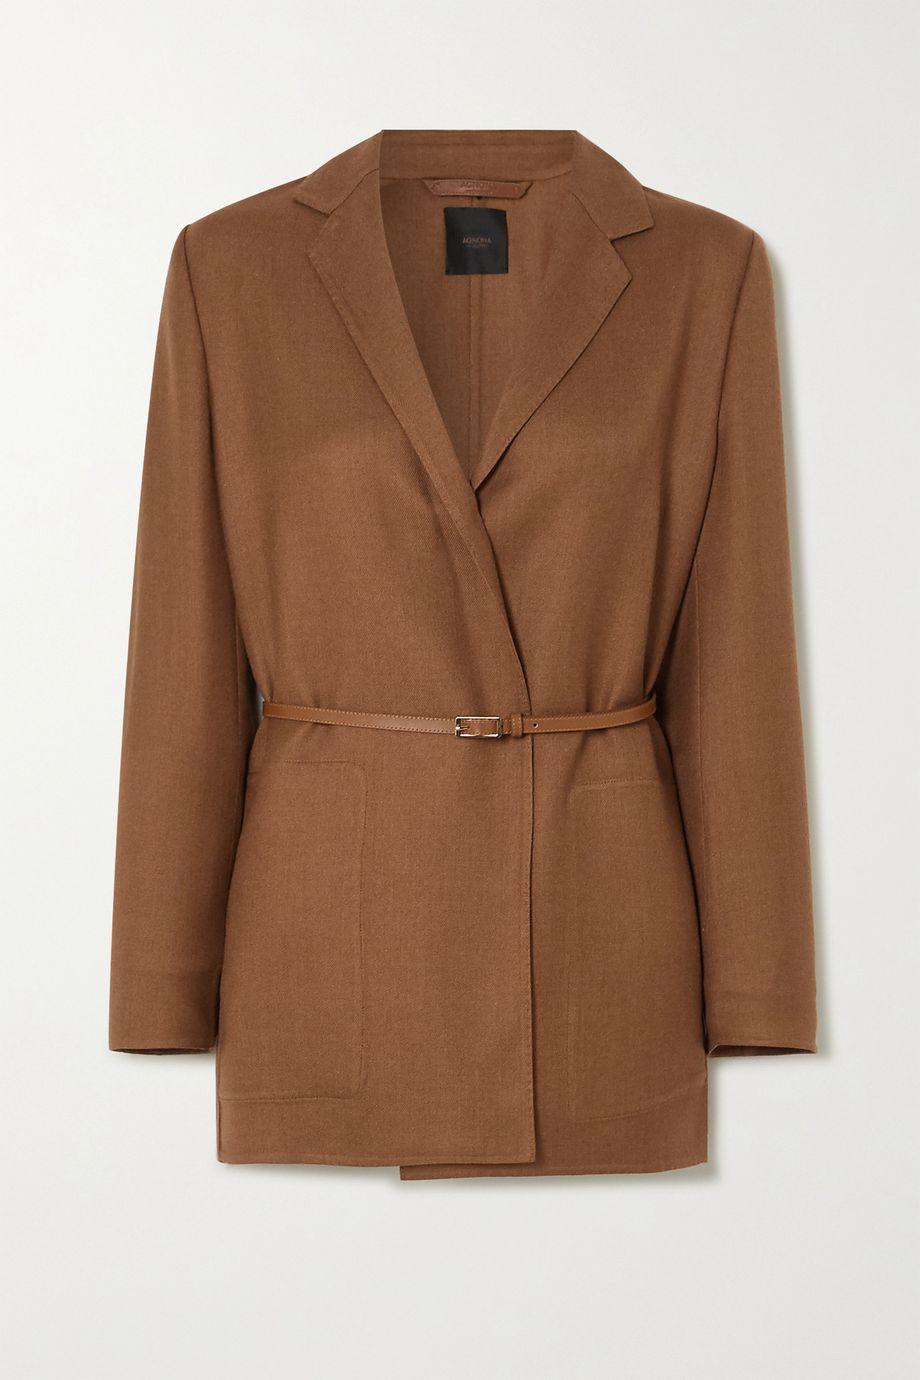 Agnona Eternals 配腰带羊绒真丝混纺斜纹布围裹式西装外套